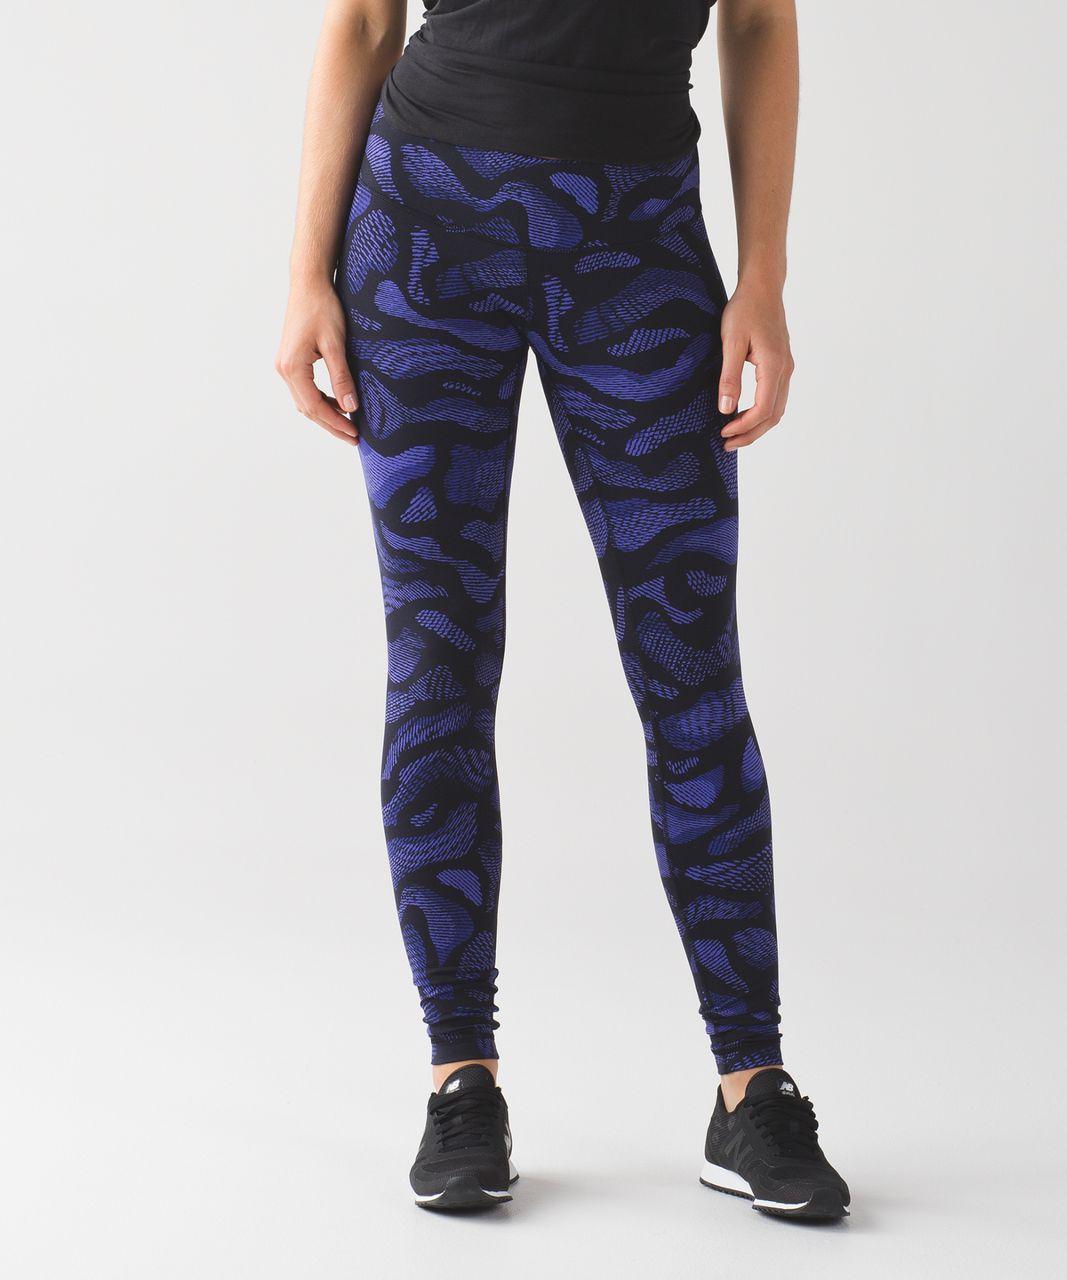 c33cda910 Lululemon Wunder Under Pant III - Warp Super Purple Black - lulu fanatics